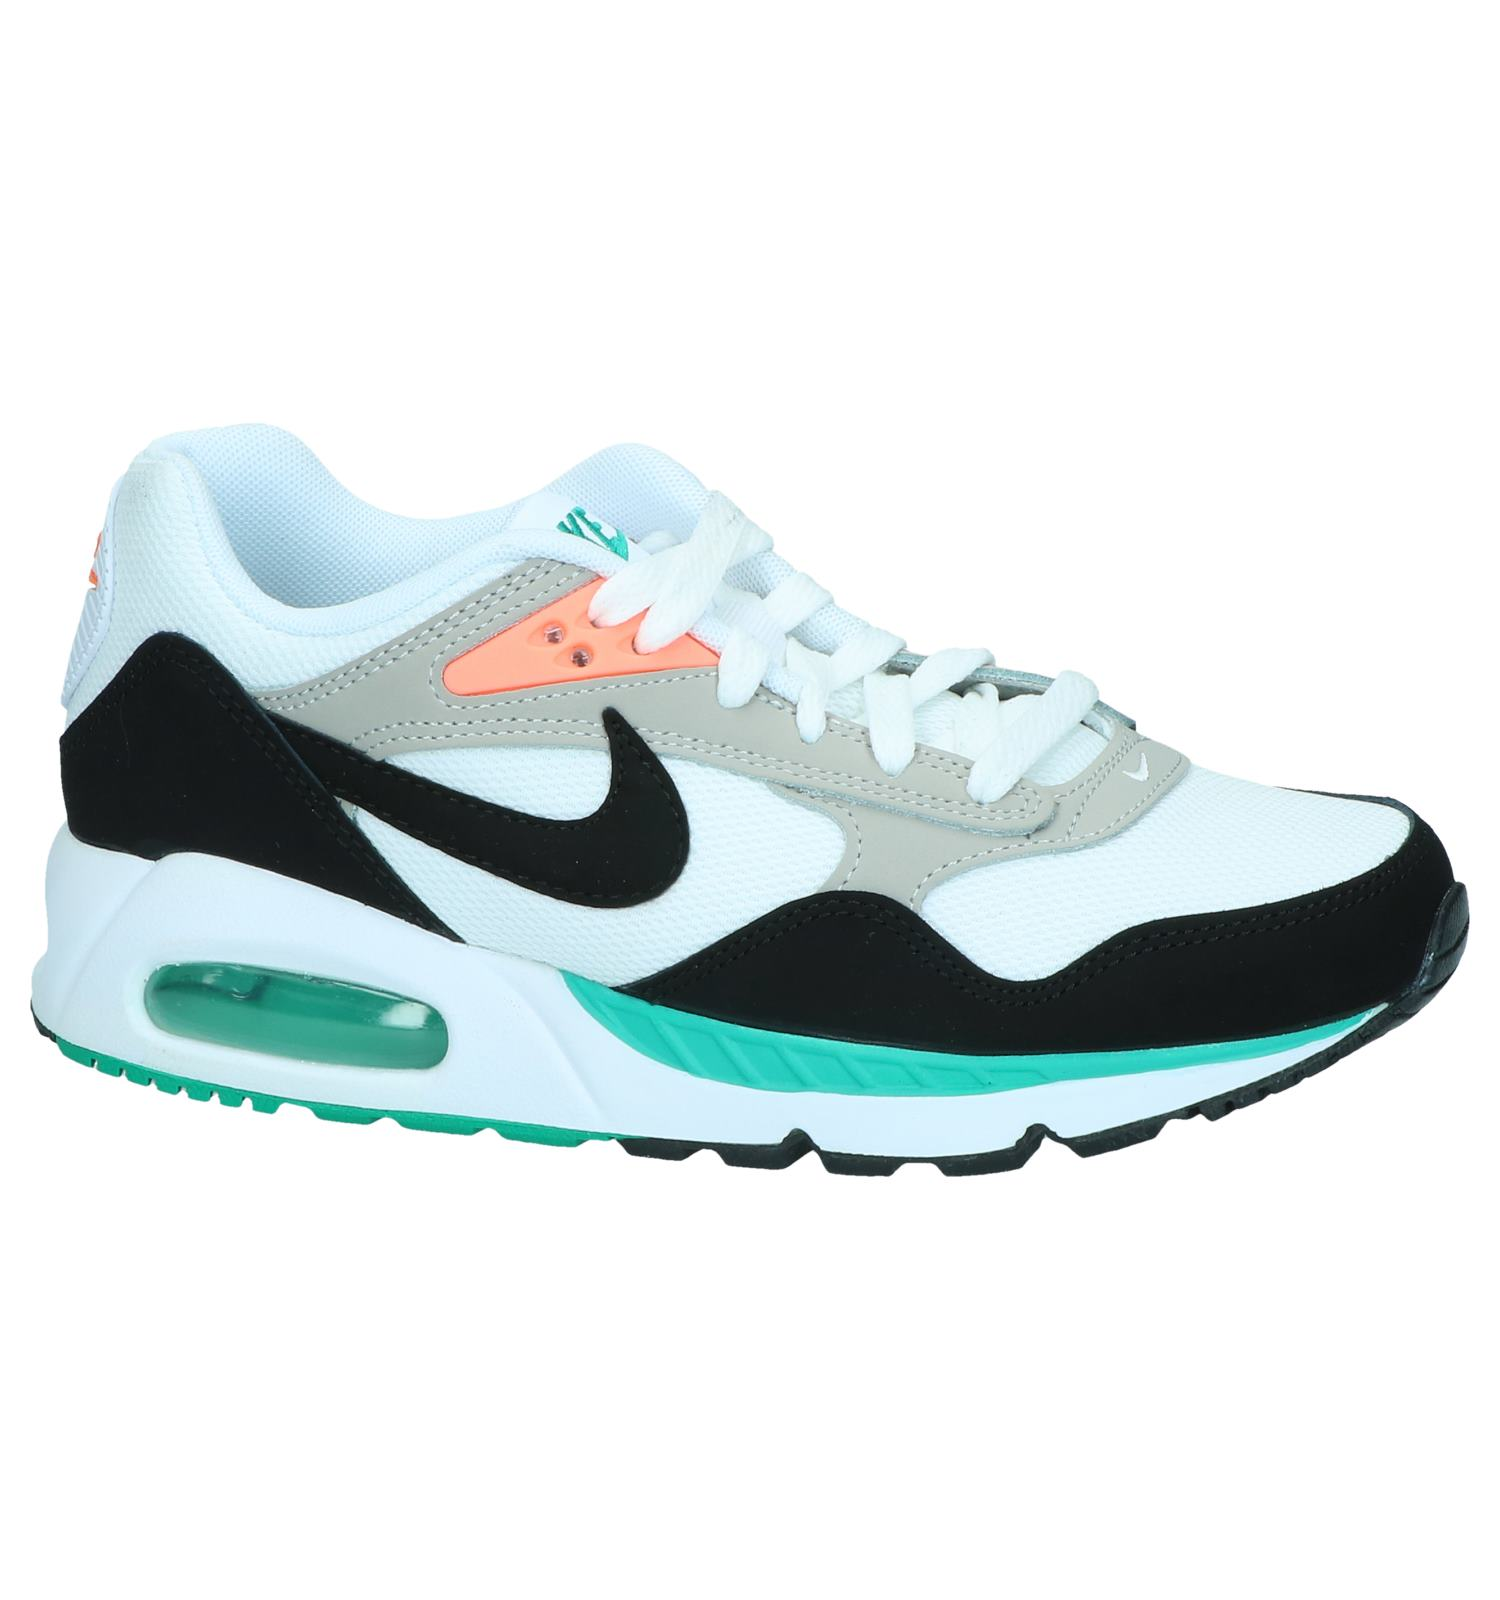 Witte Sneakers Nike Air Max Correlate   SCHOENENTORFS.NL   Gratis verzend en retour